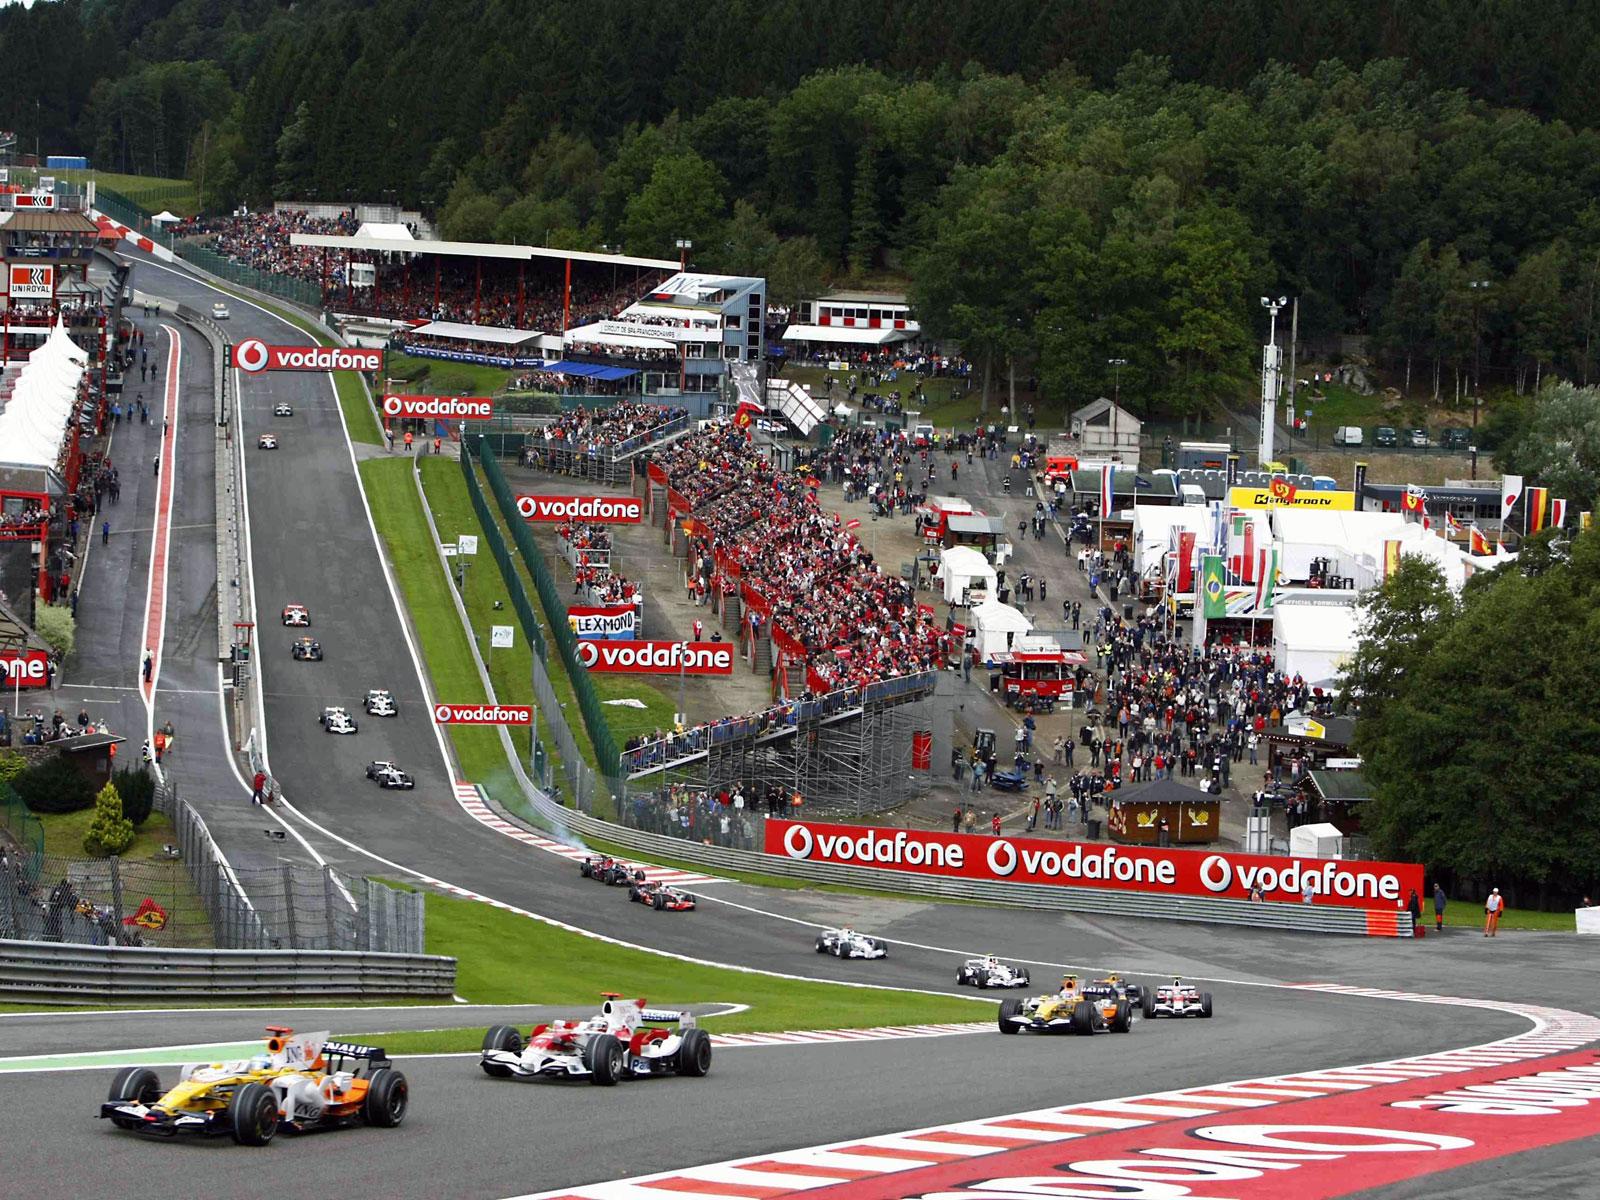 F1 resor till Belgien, Italien, Spanien, Monaco mm